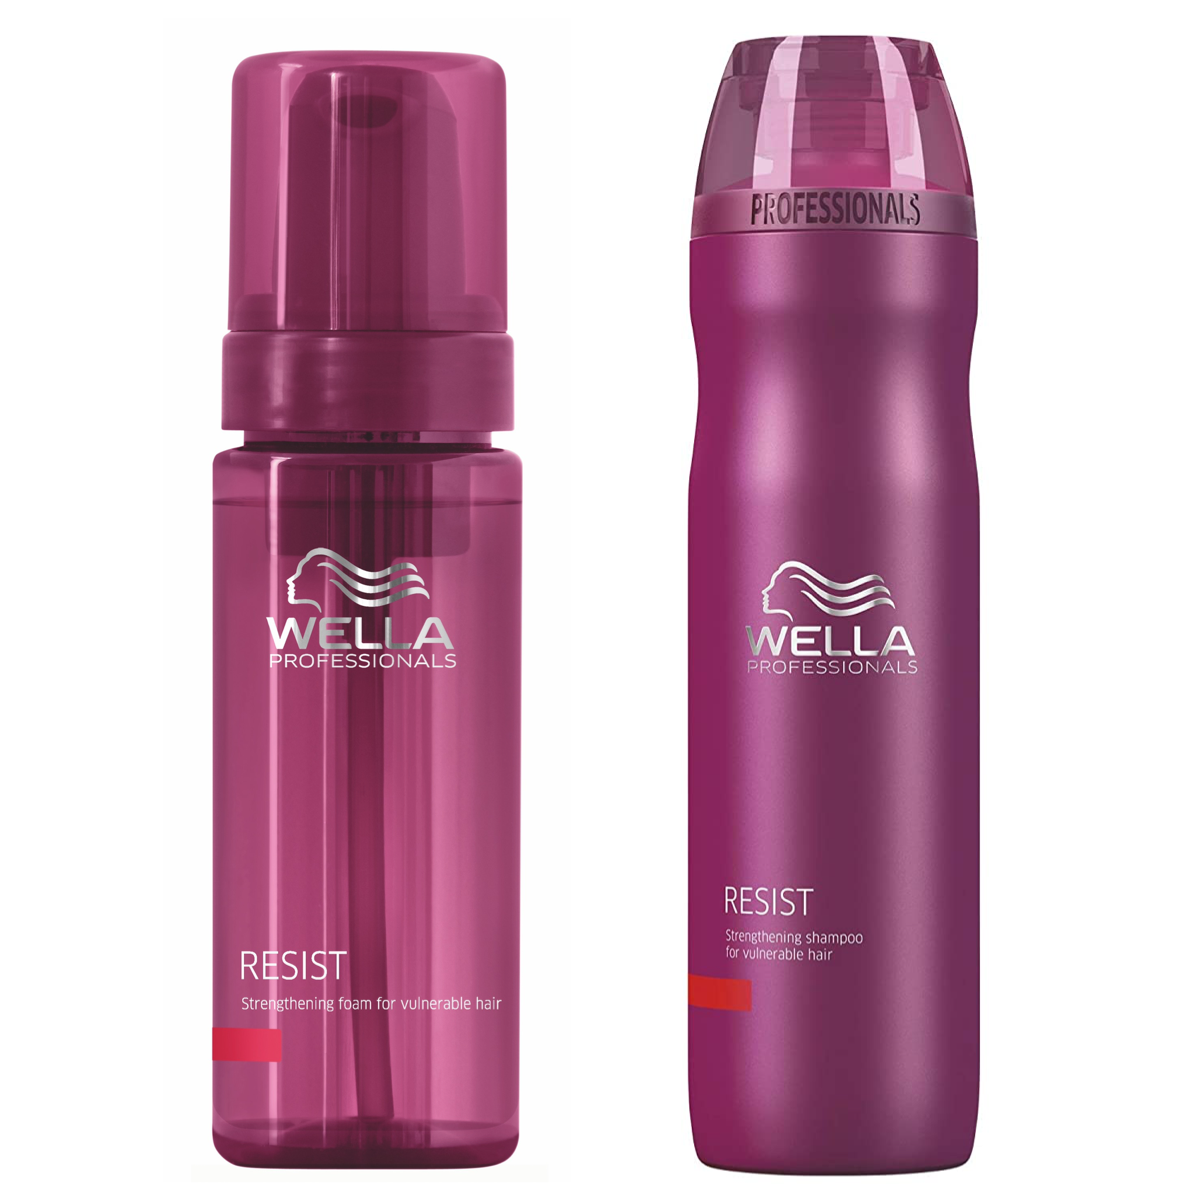 Wella Resist Fortalecedor Shampoo 250ml Y Espuma 150ml